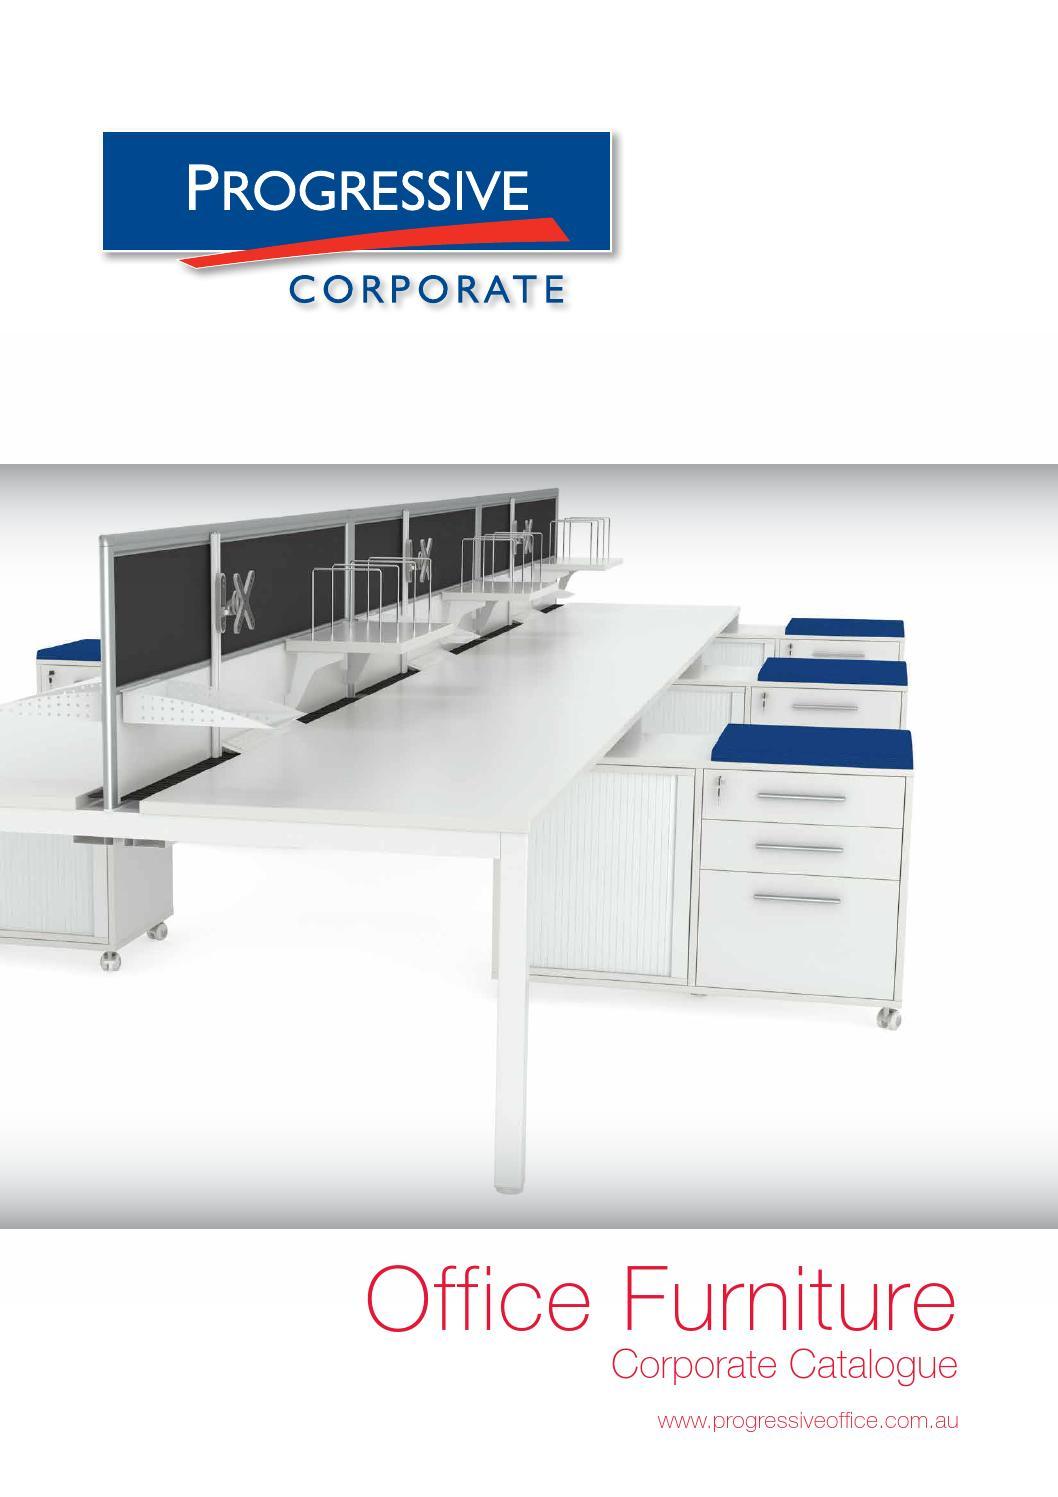 Progressive Corporate Office Furniture Catalogue Olg01987 V3 By Progressive Office Furniture